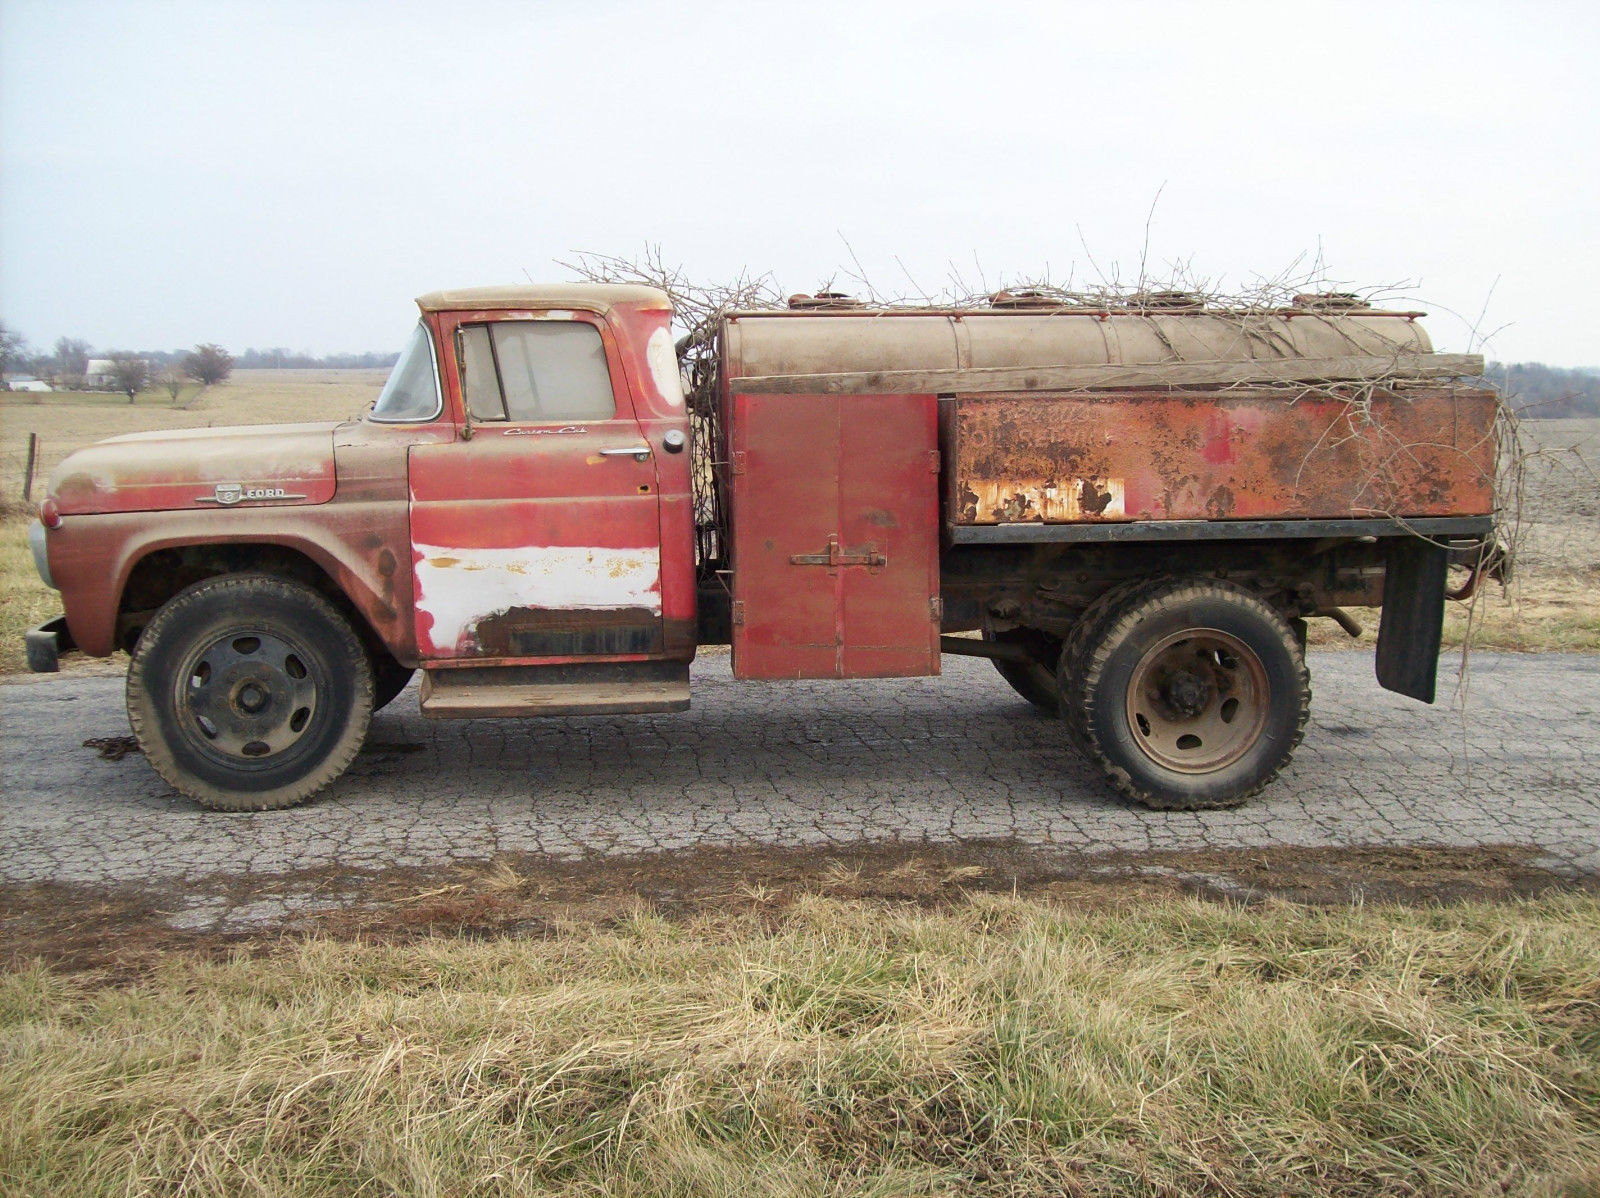 1959 ford f 600 vintage fuel delivery truck for sale in lenexa kansas united states. Black Bedroom Furniture Sets. Home Design Ideas